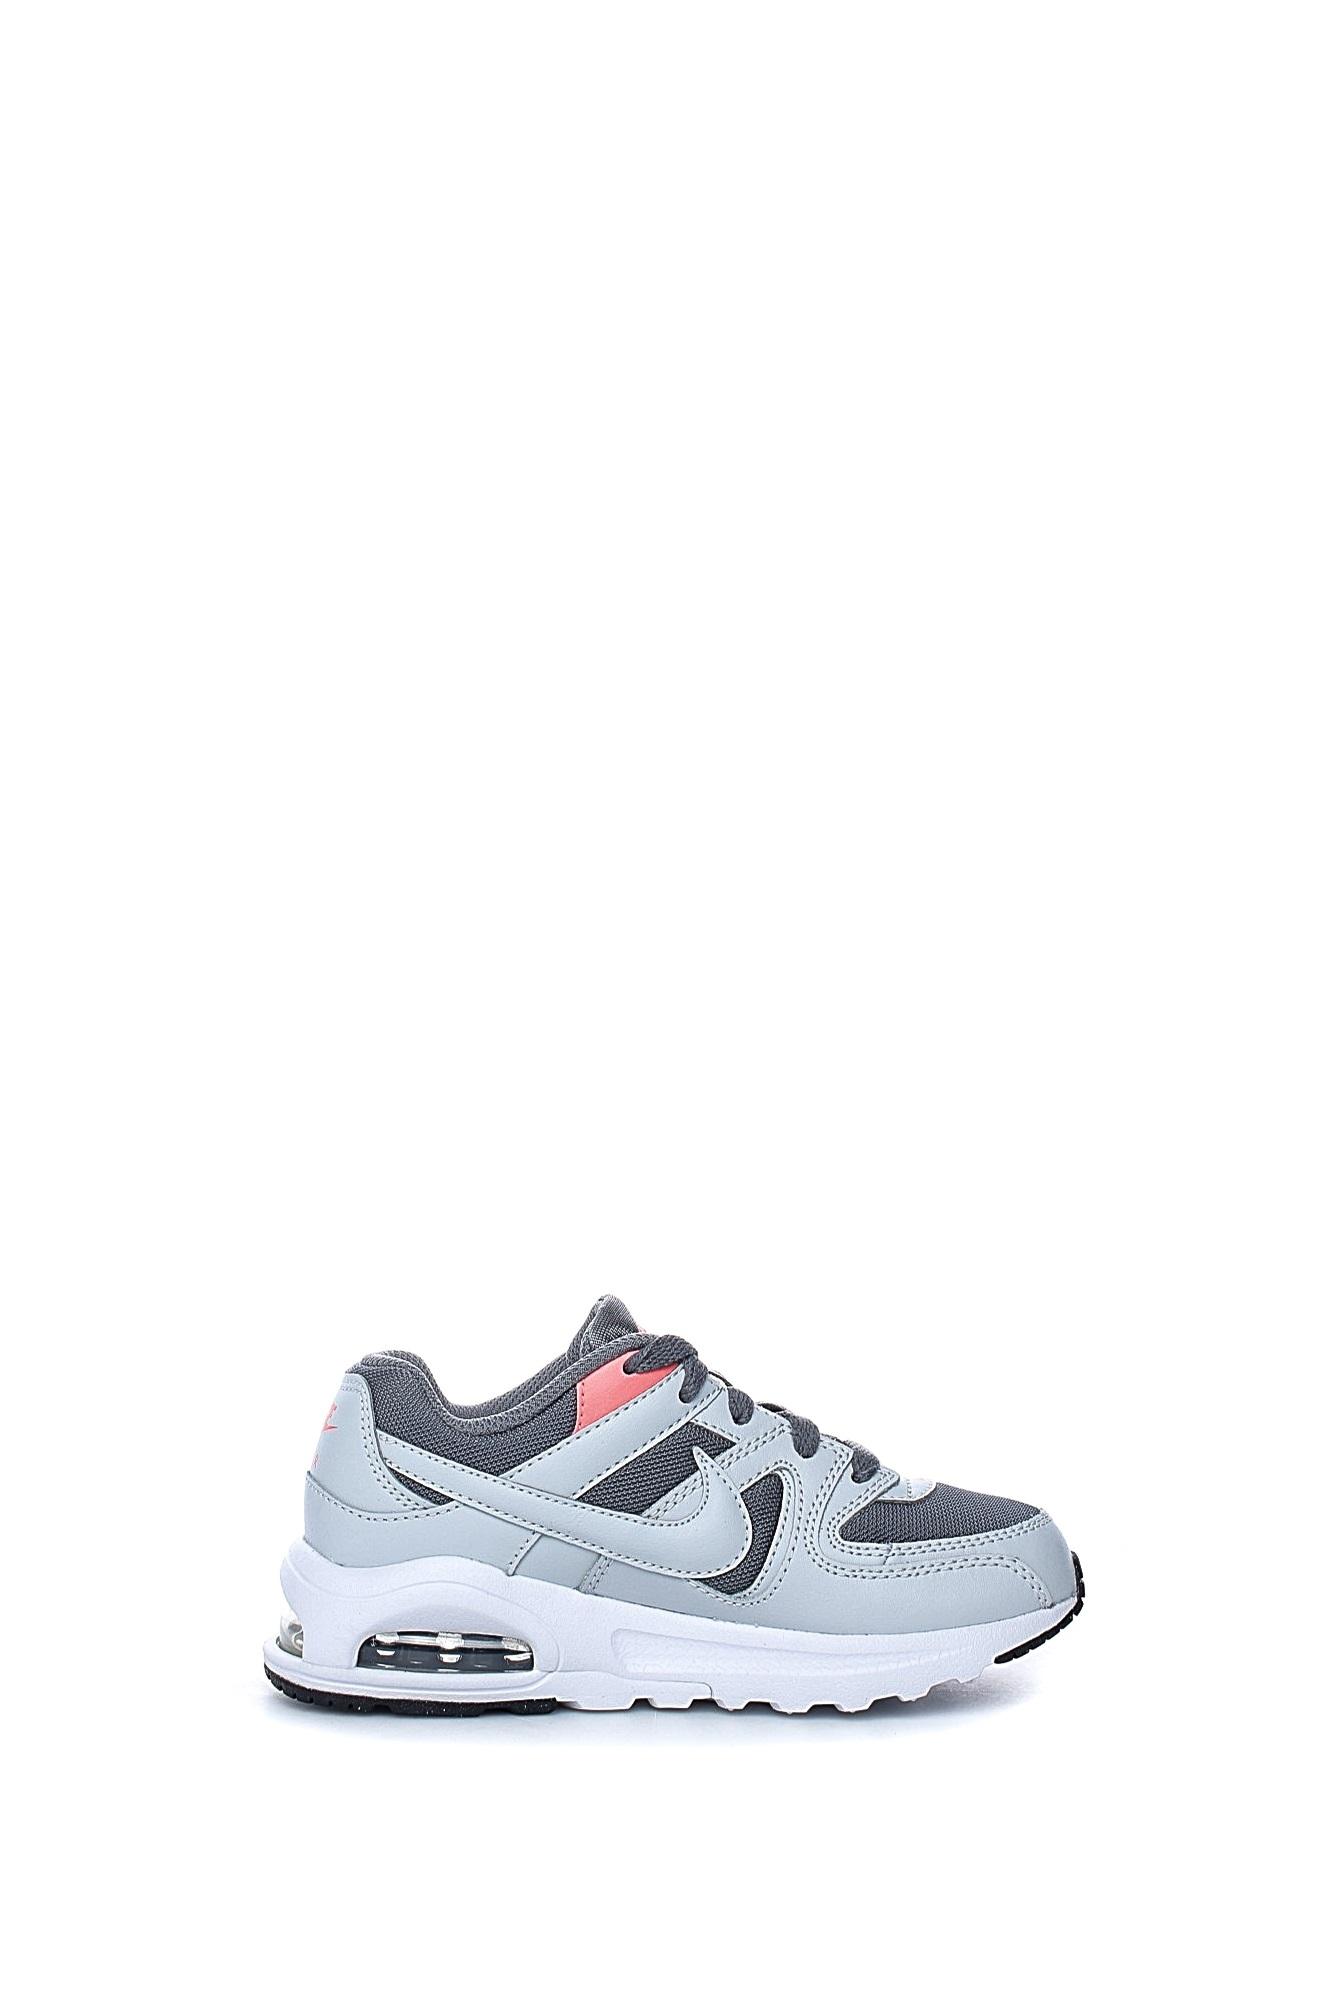 best service d6707 9306c NIKE - Παιδικά αθλητικά παπούτσια Nike AIR MAX COMMAND FLEX (PS) γκρι